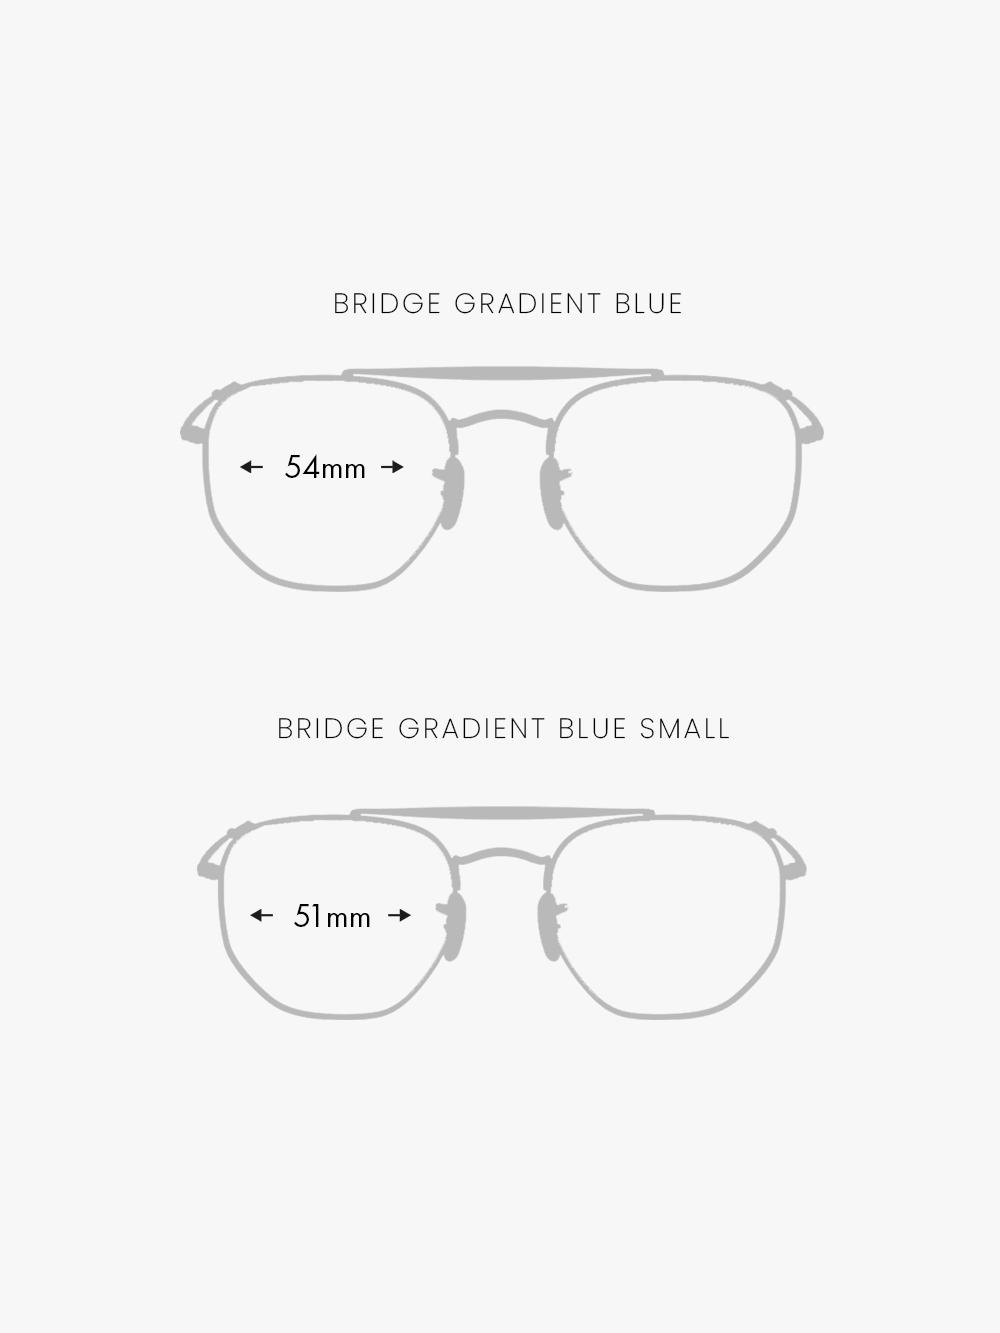 bridge-gradient-blue-sizes